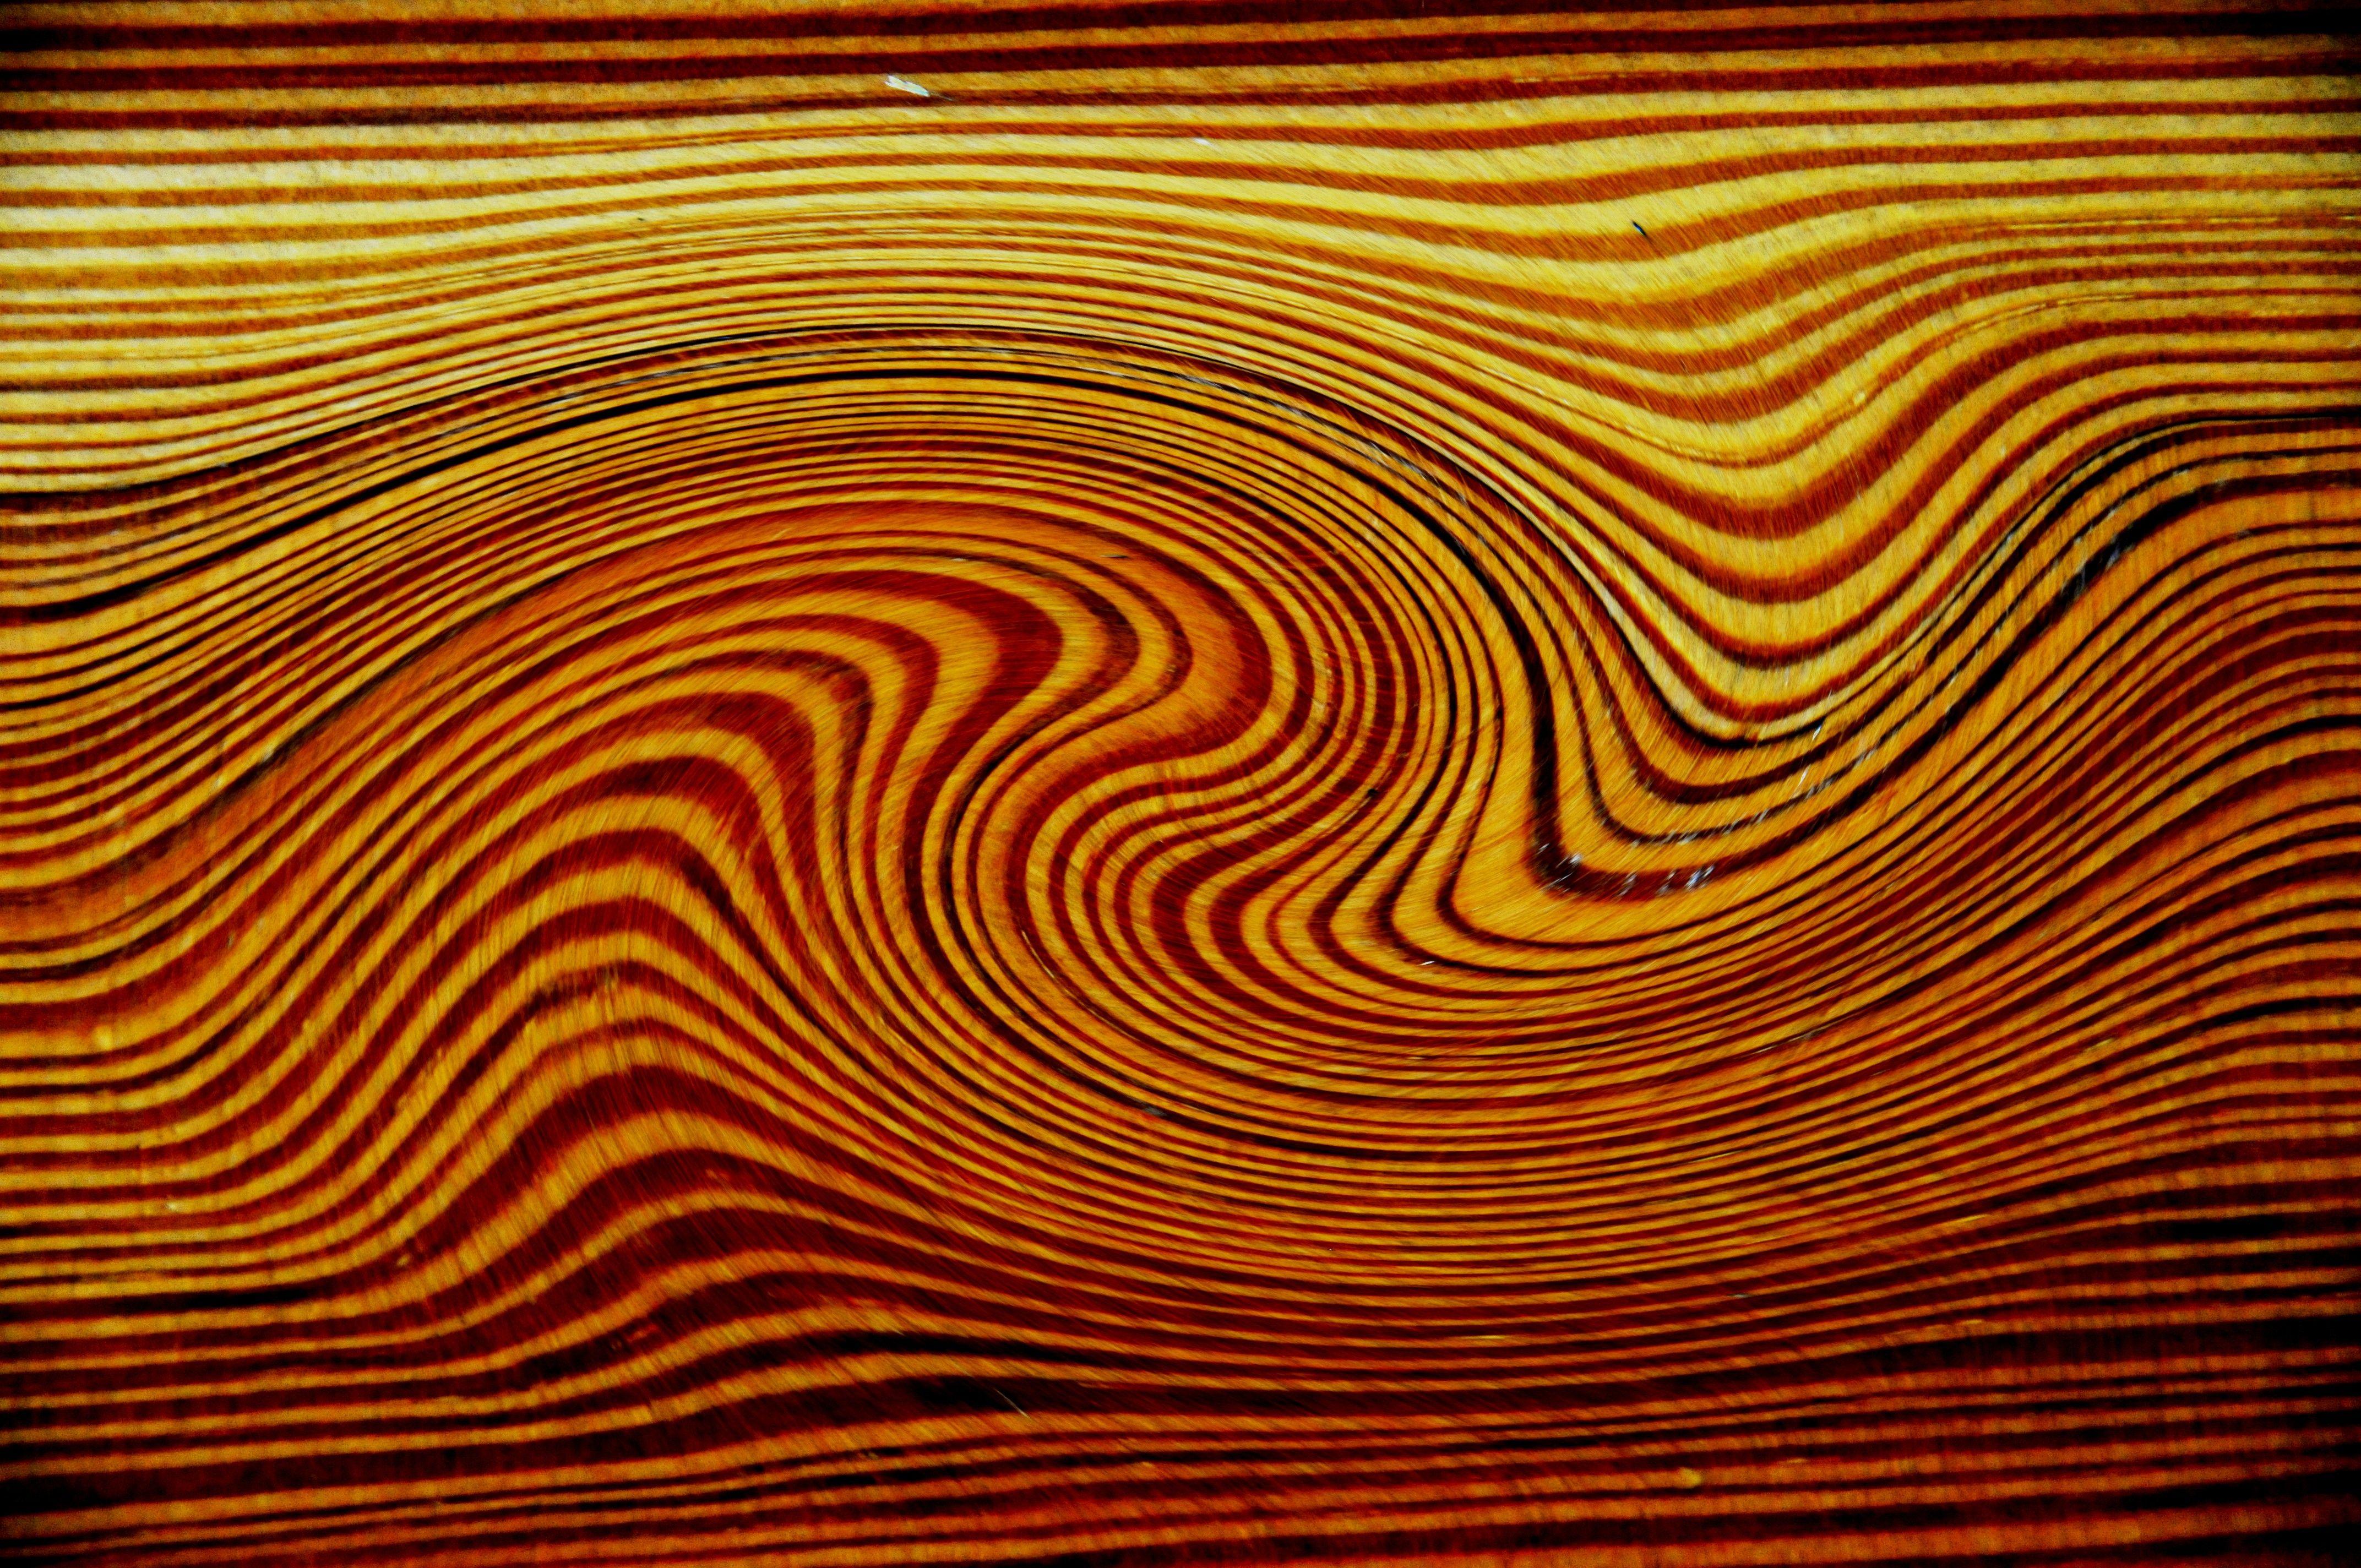 Wood Grain Mpa 5093 Swirled Wood Grain 3 Wood Wood